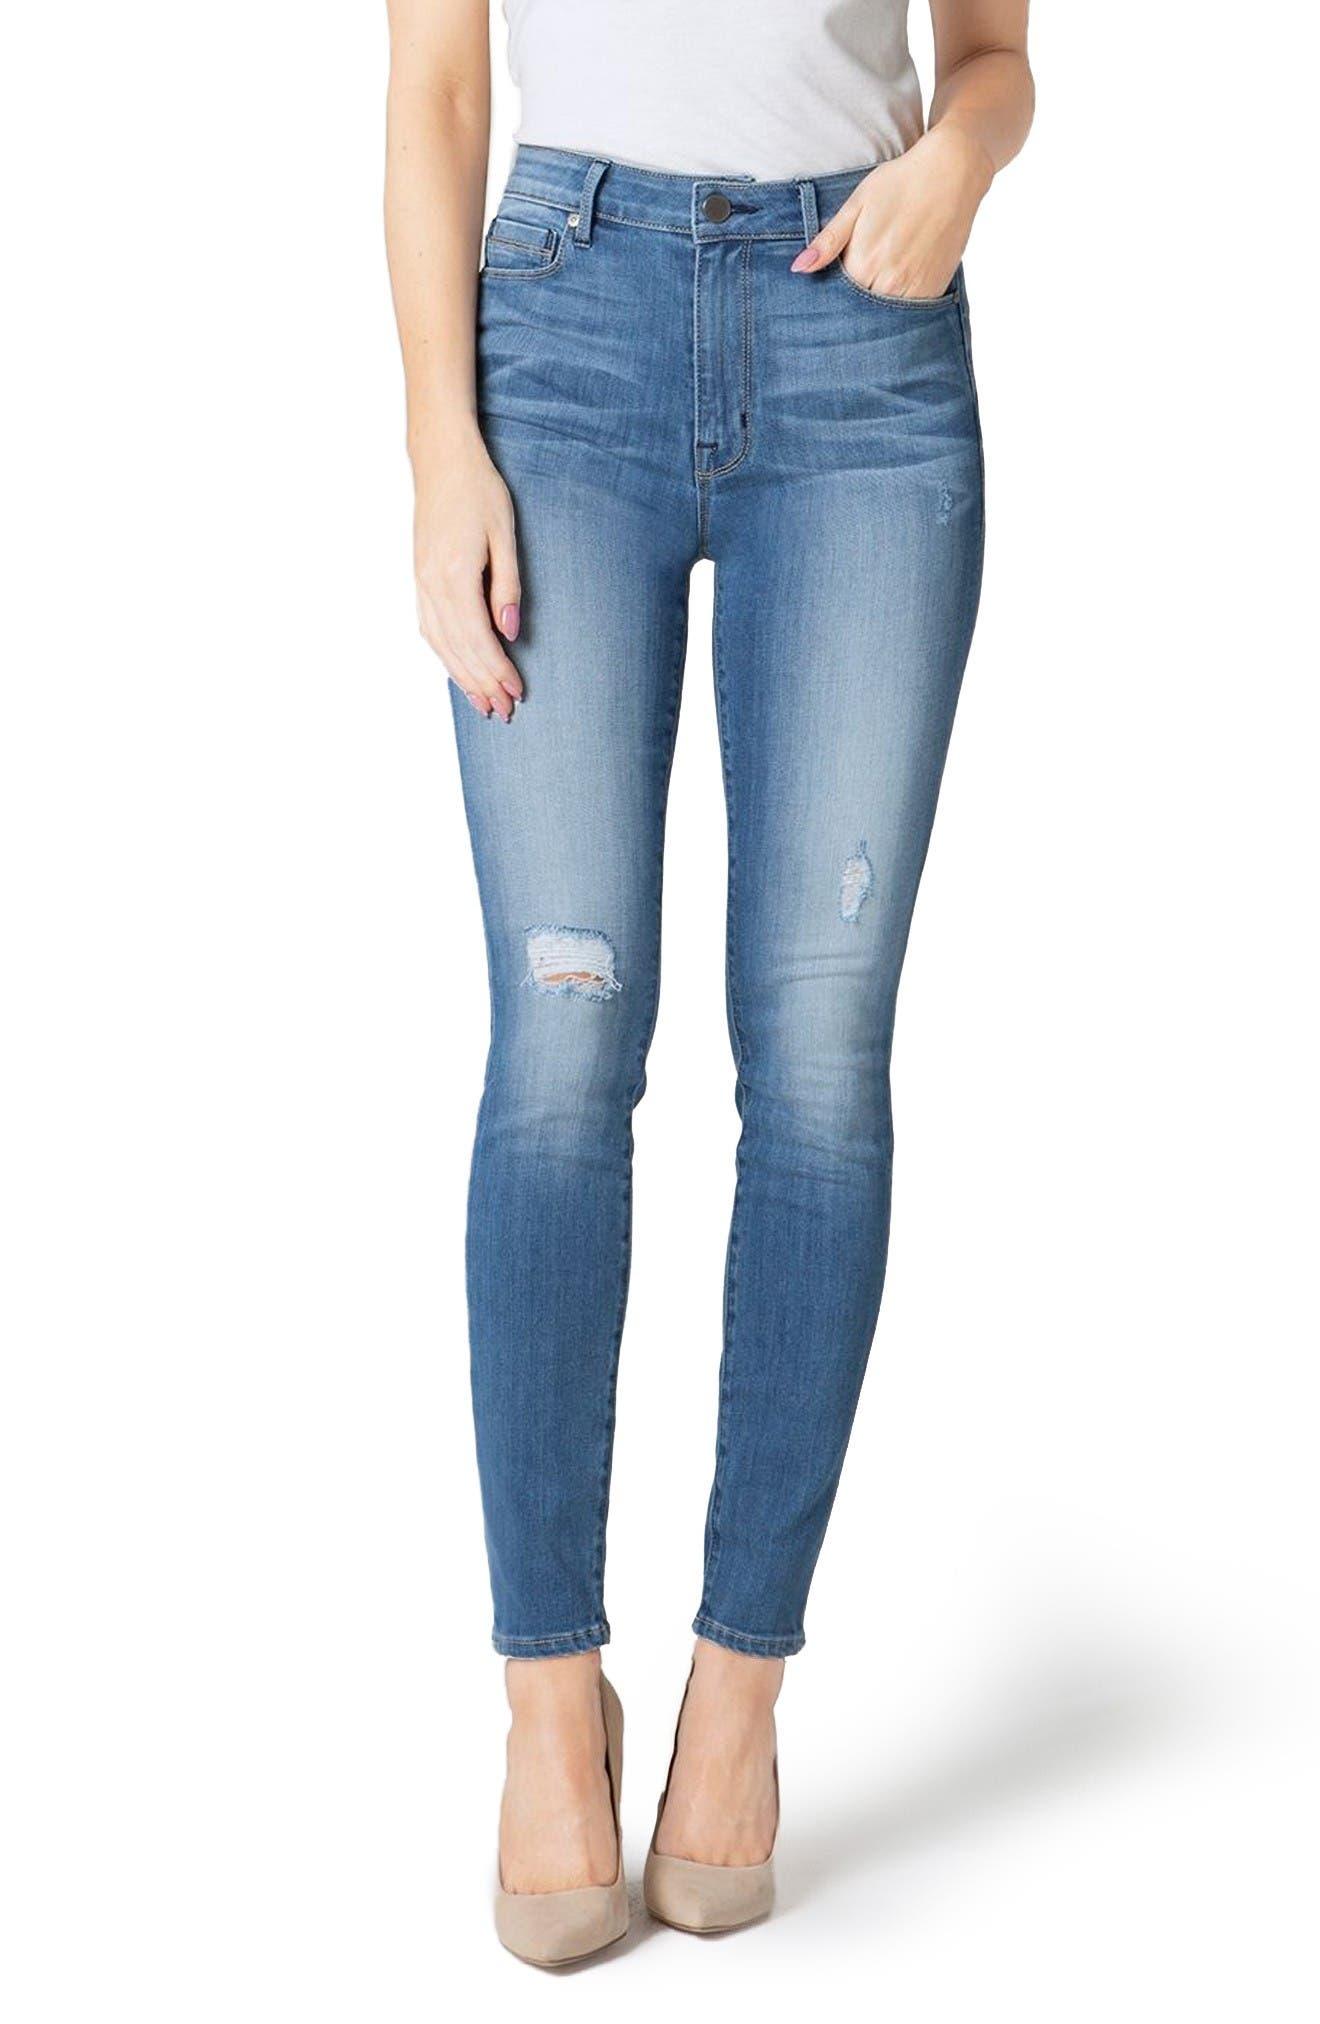 Main Image - PARKER SMITH Bombshell High Waist Stretch Skinny Jeans (Gulf Stream)